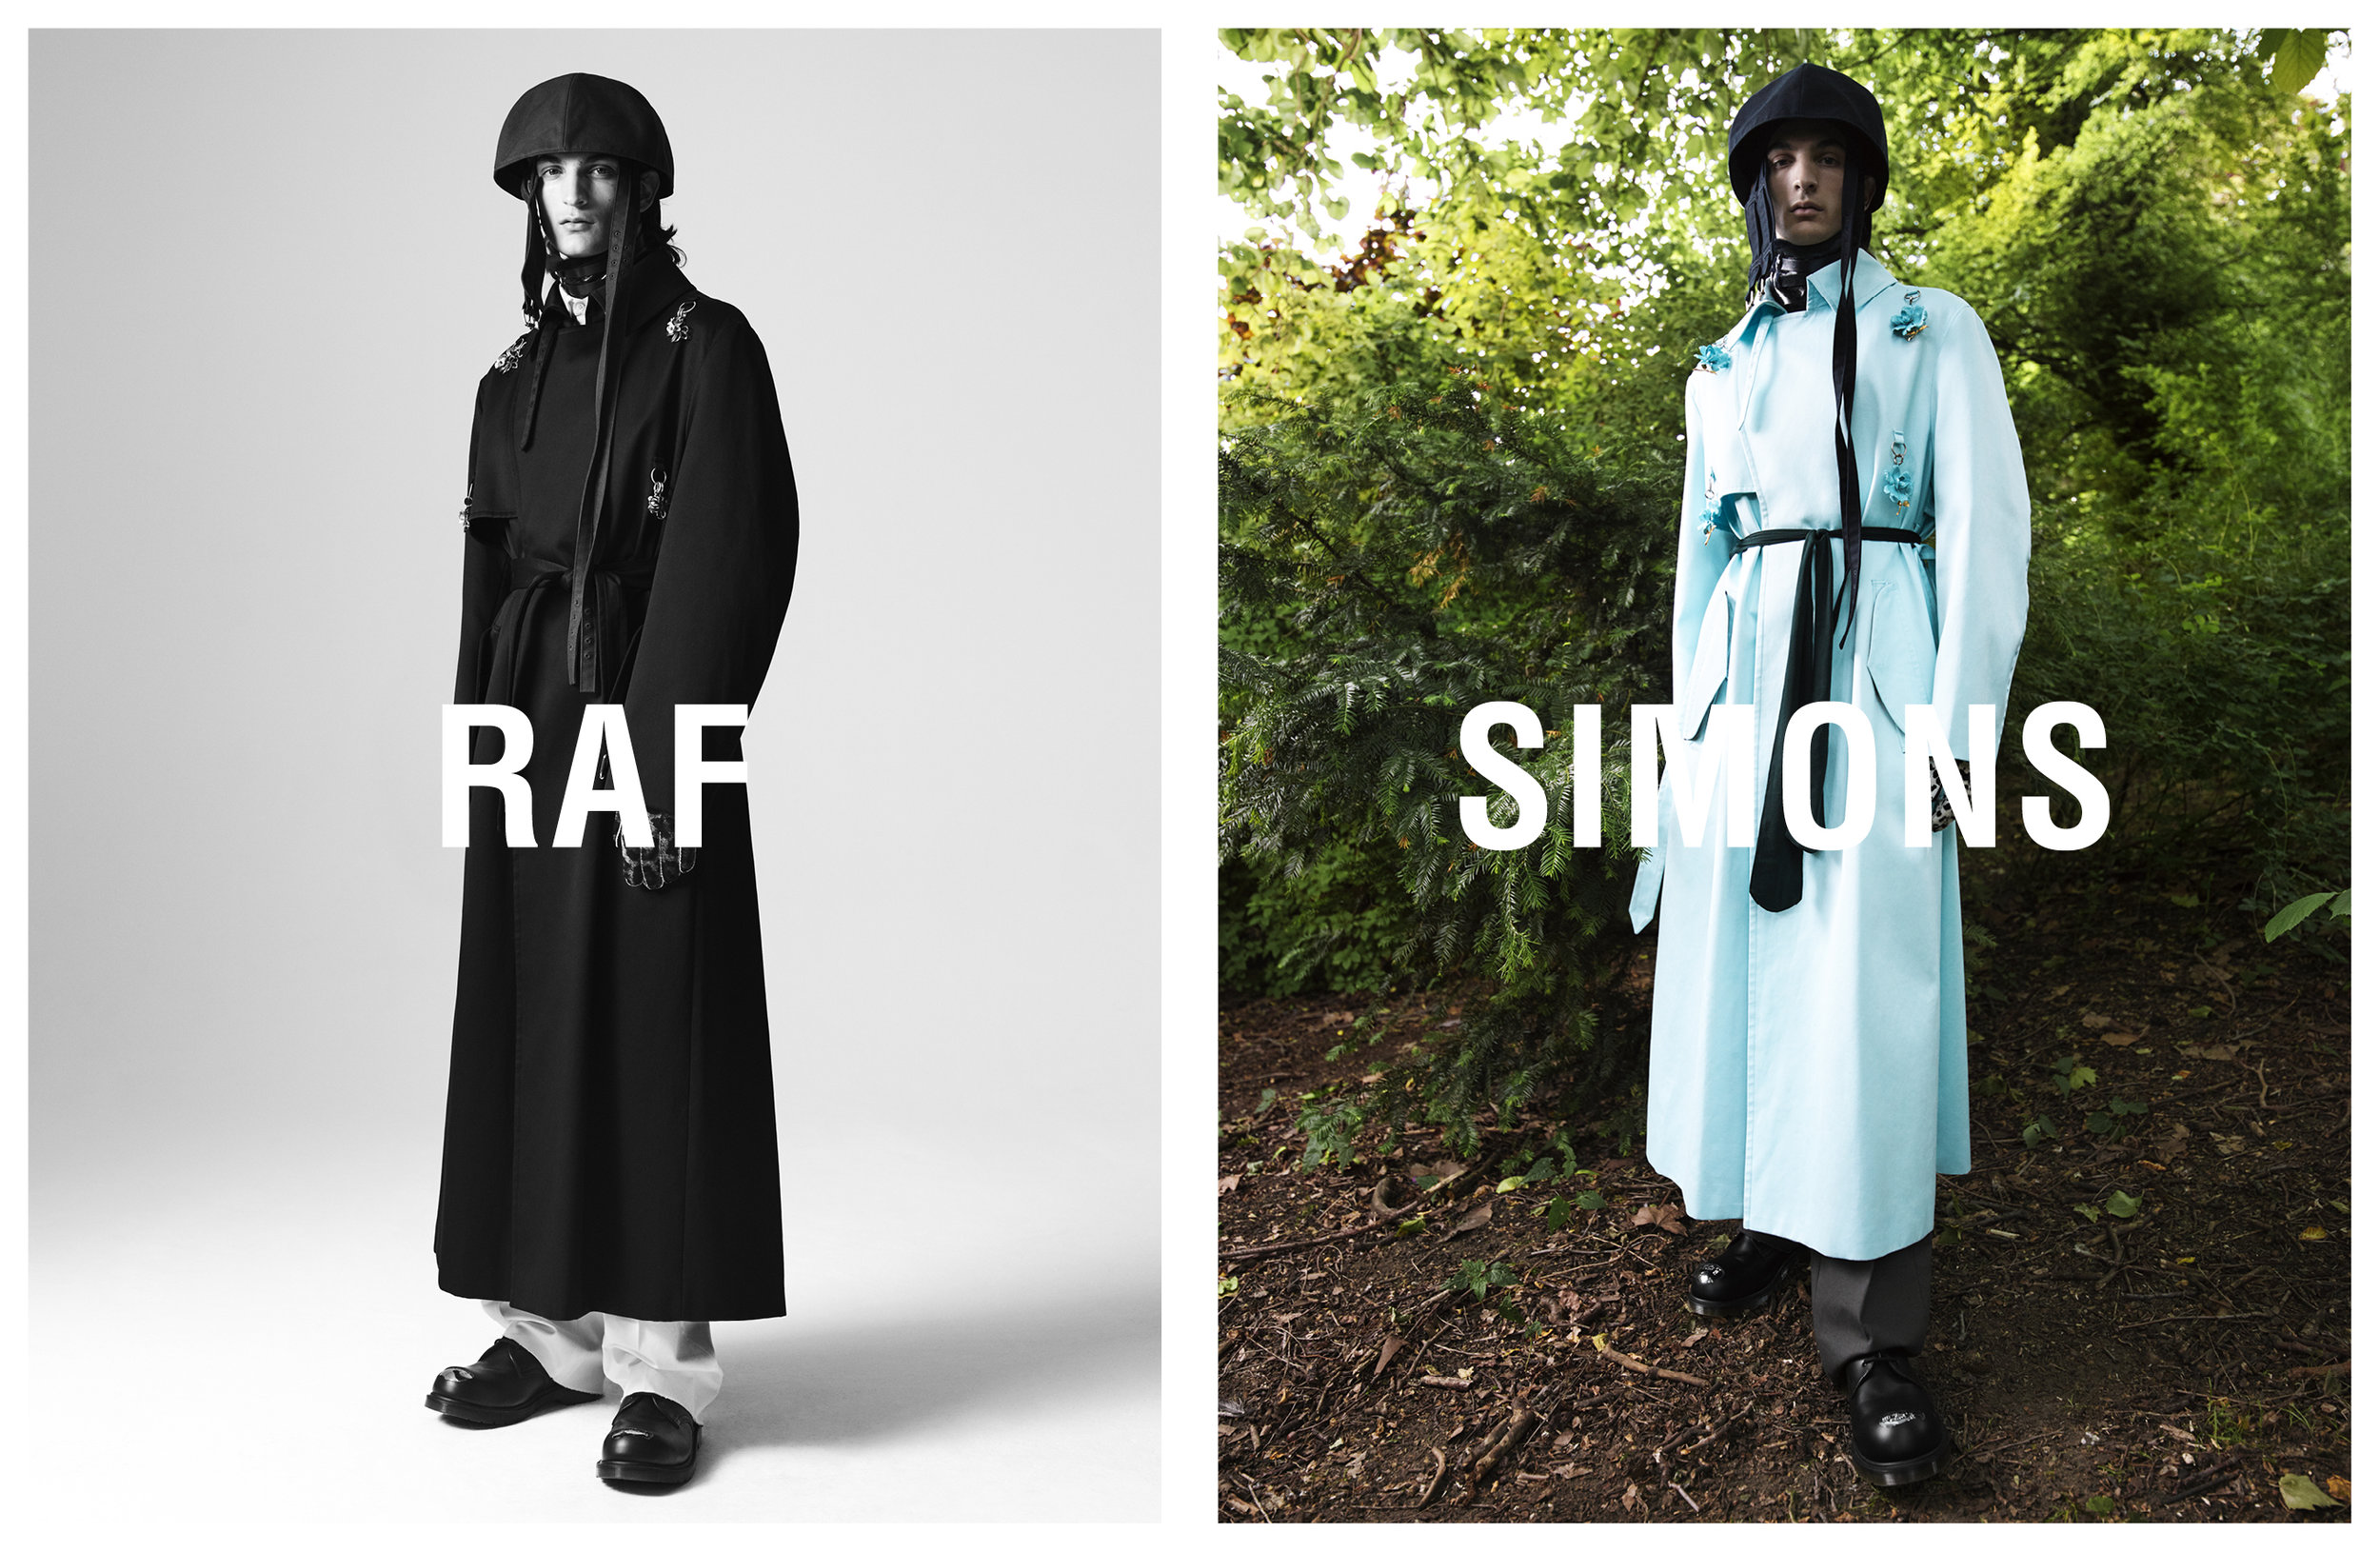 raf_simons_fall_2019_campaign1.jpg